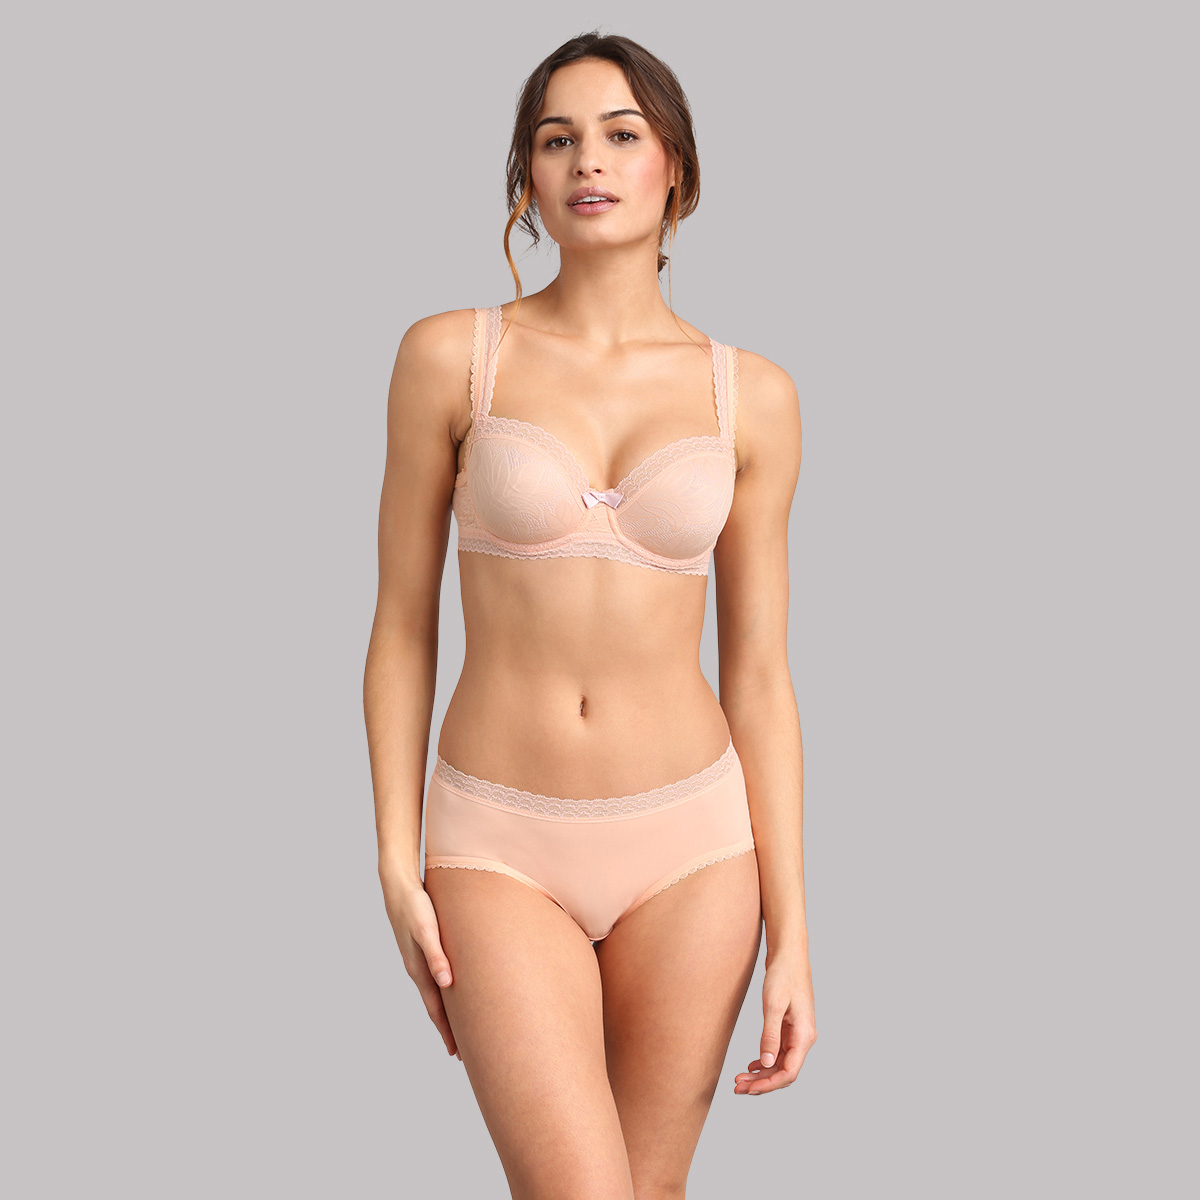 Sujetador balconnet rosa pálido Invisible Elegance, , PLAYTEX